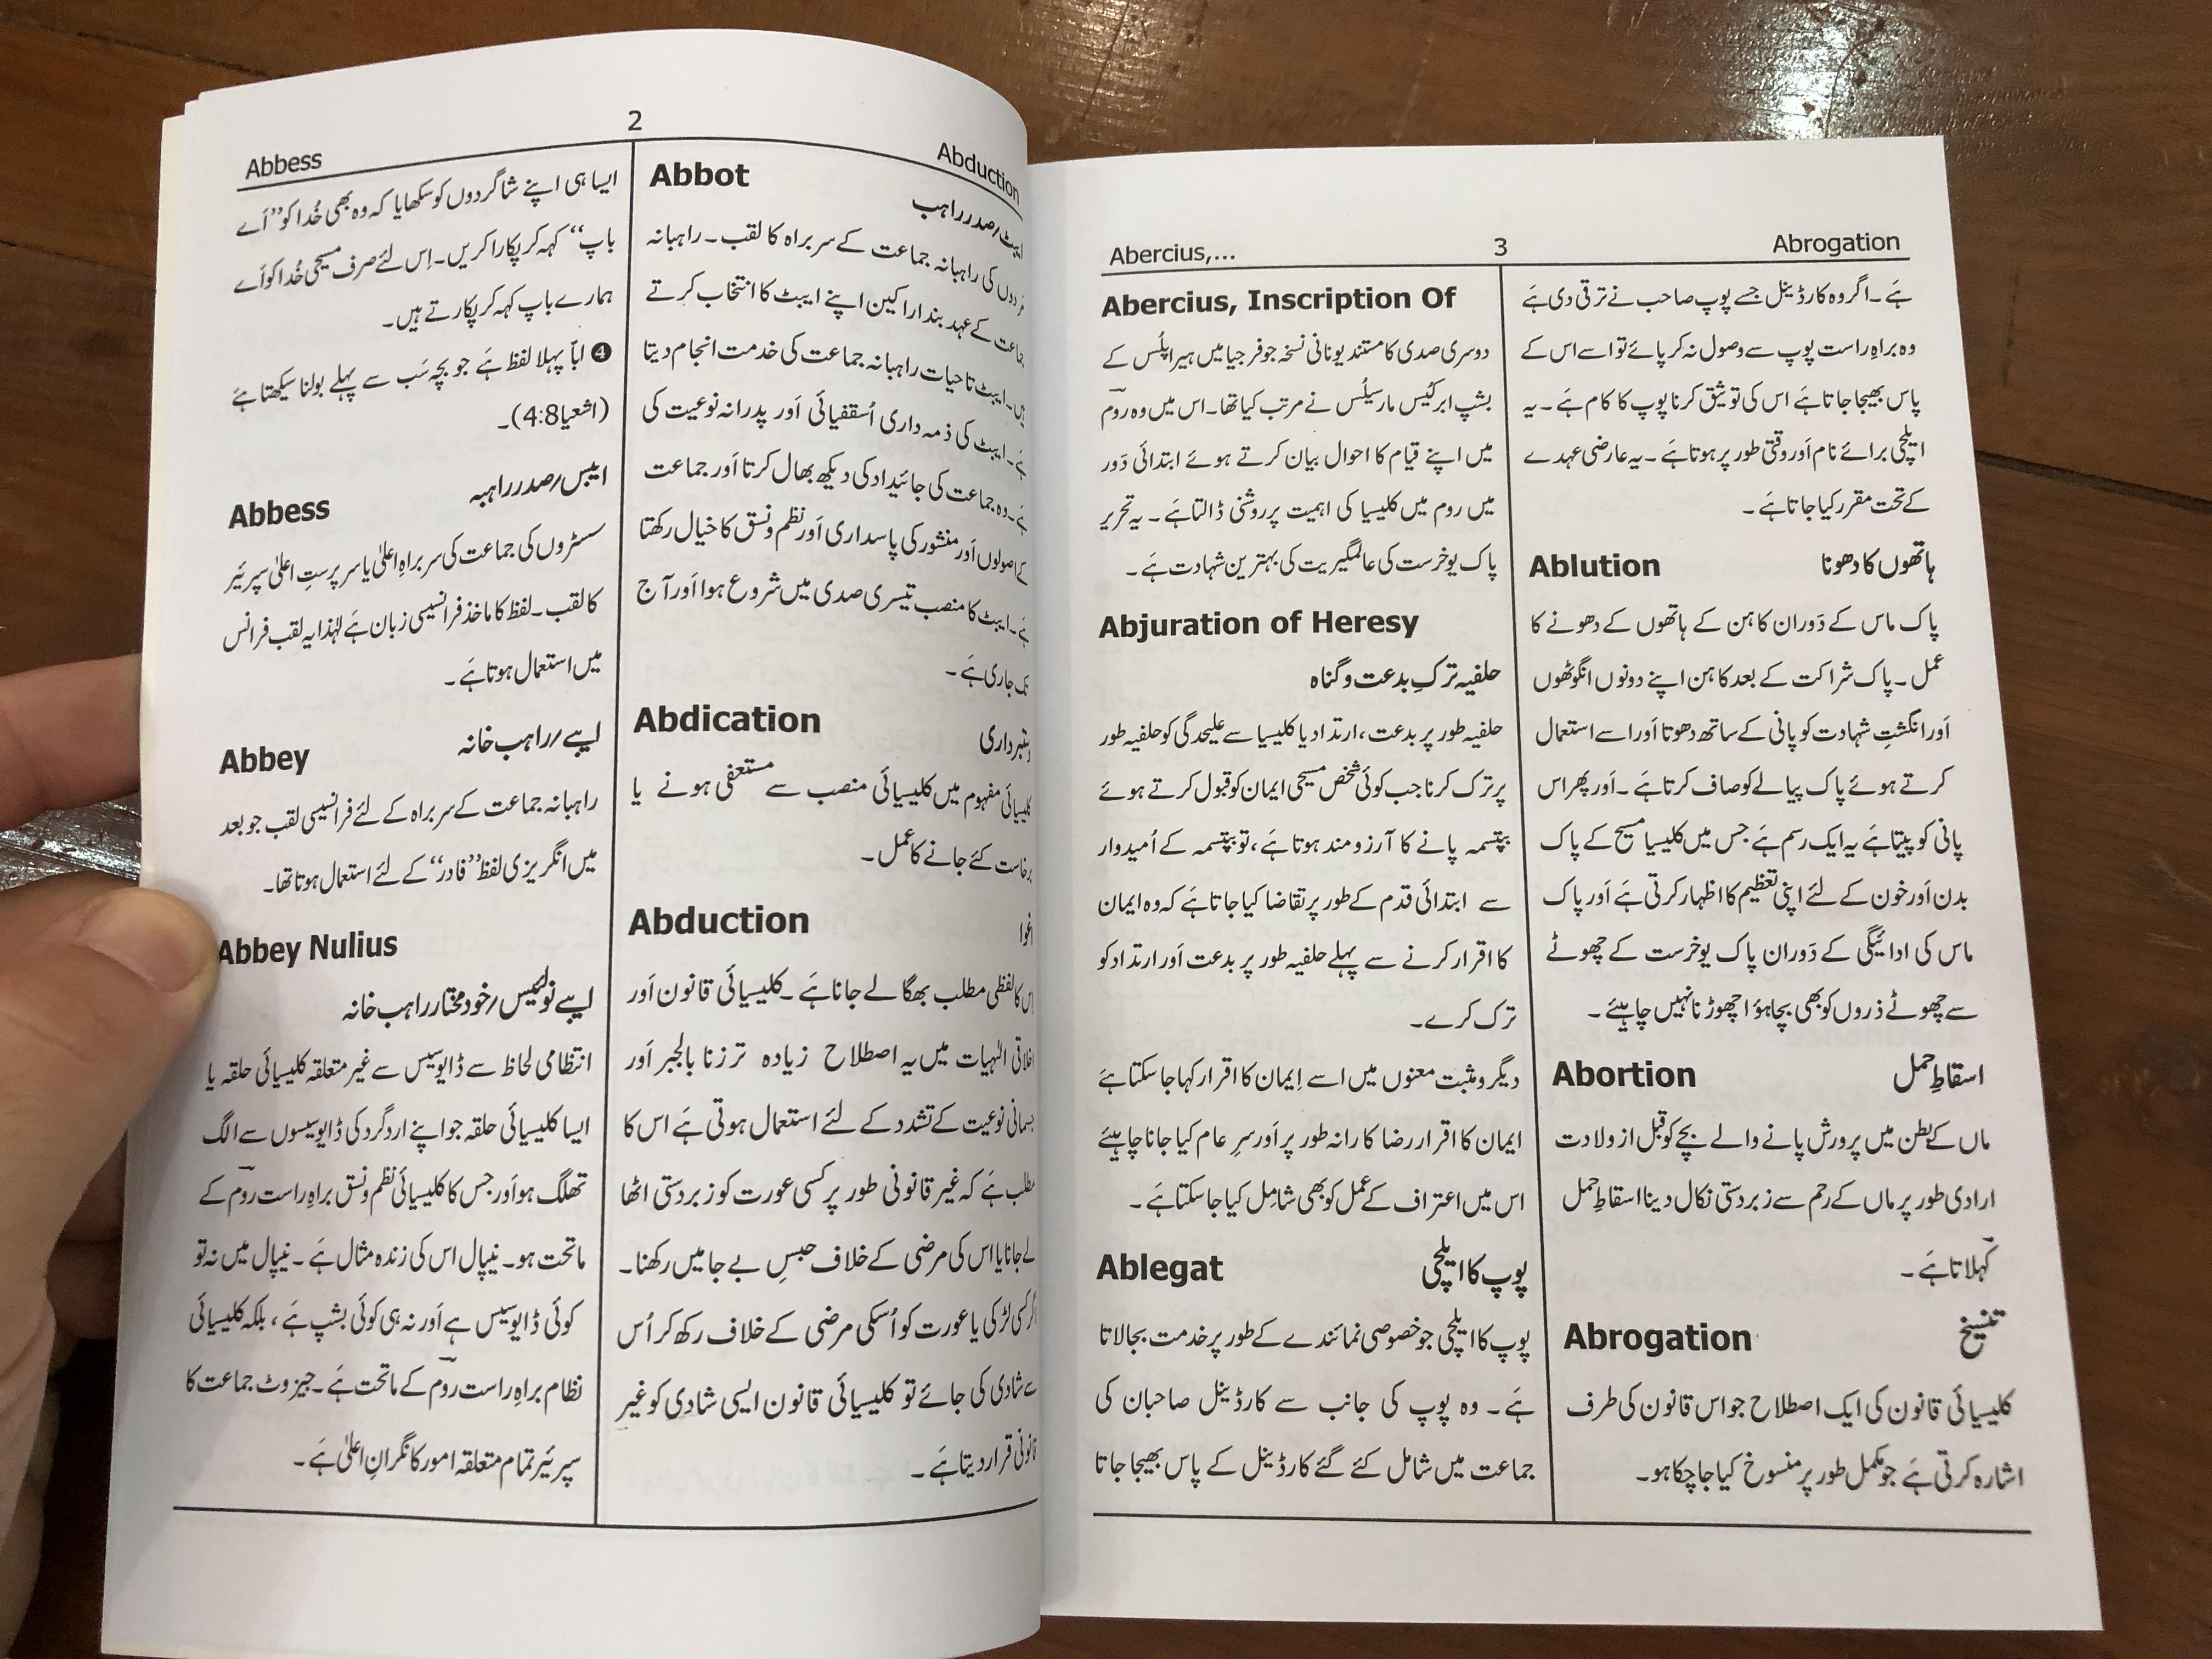 a-new-dictionary-of-christian-terminology-by-emmanuel-neno-catechetical-centre-karachi-2009-6-.jpg